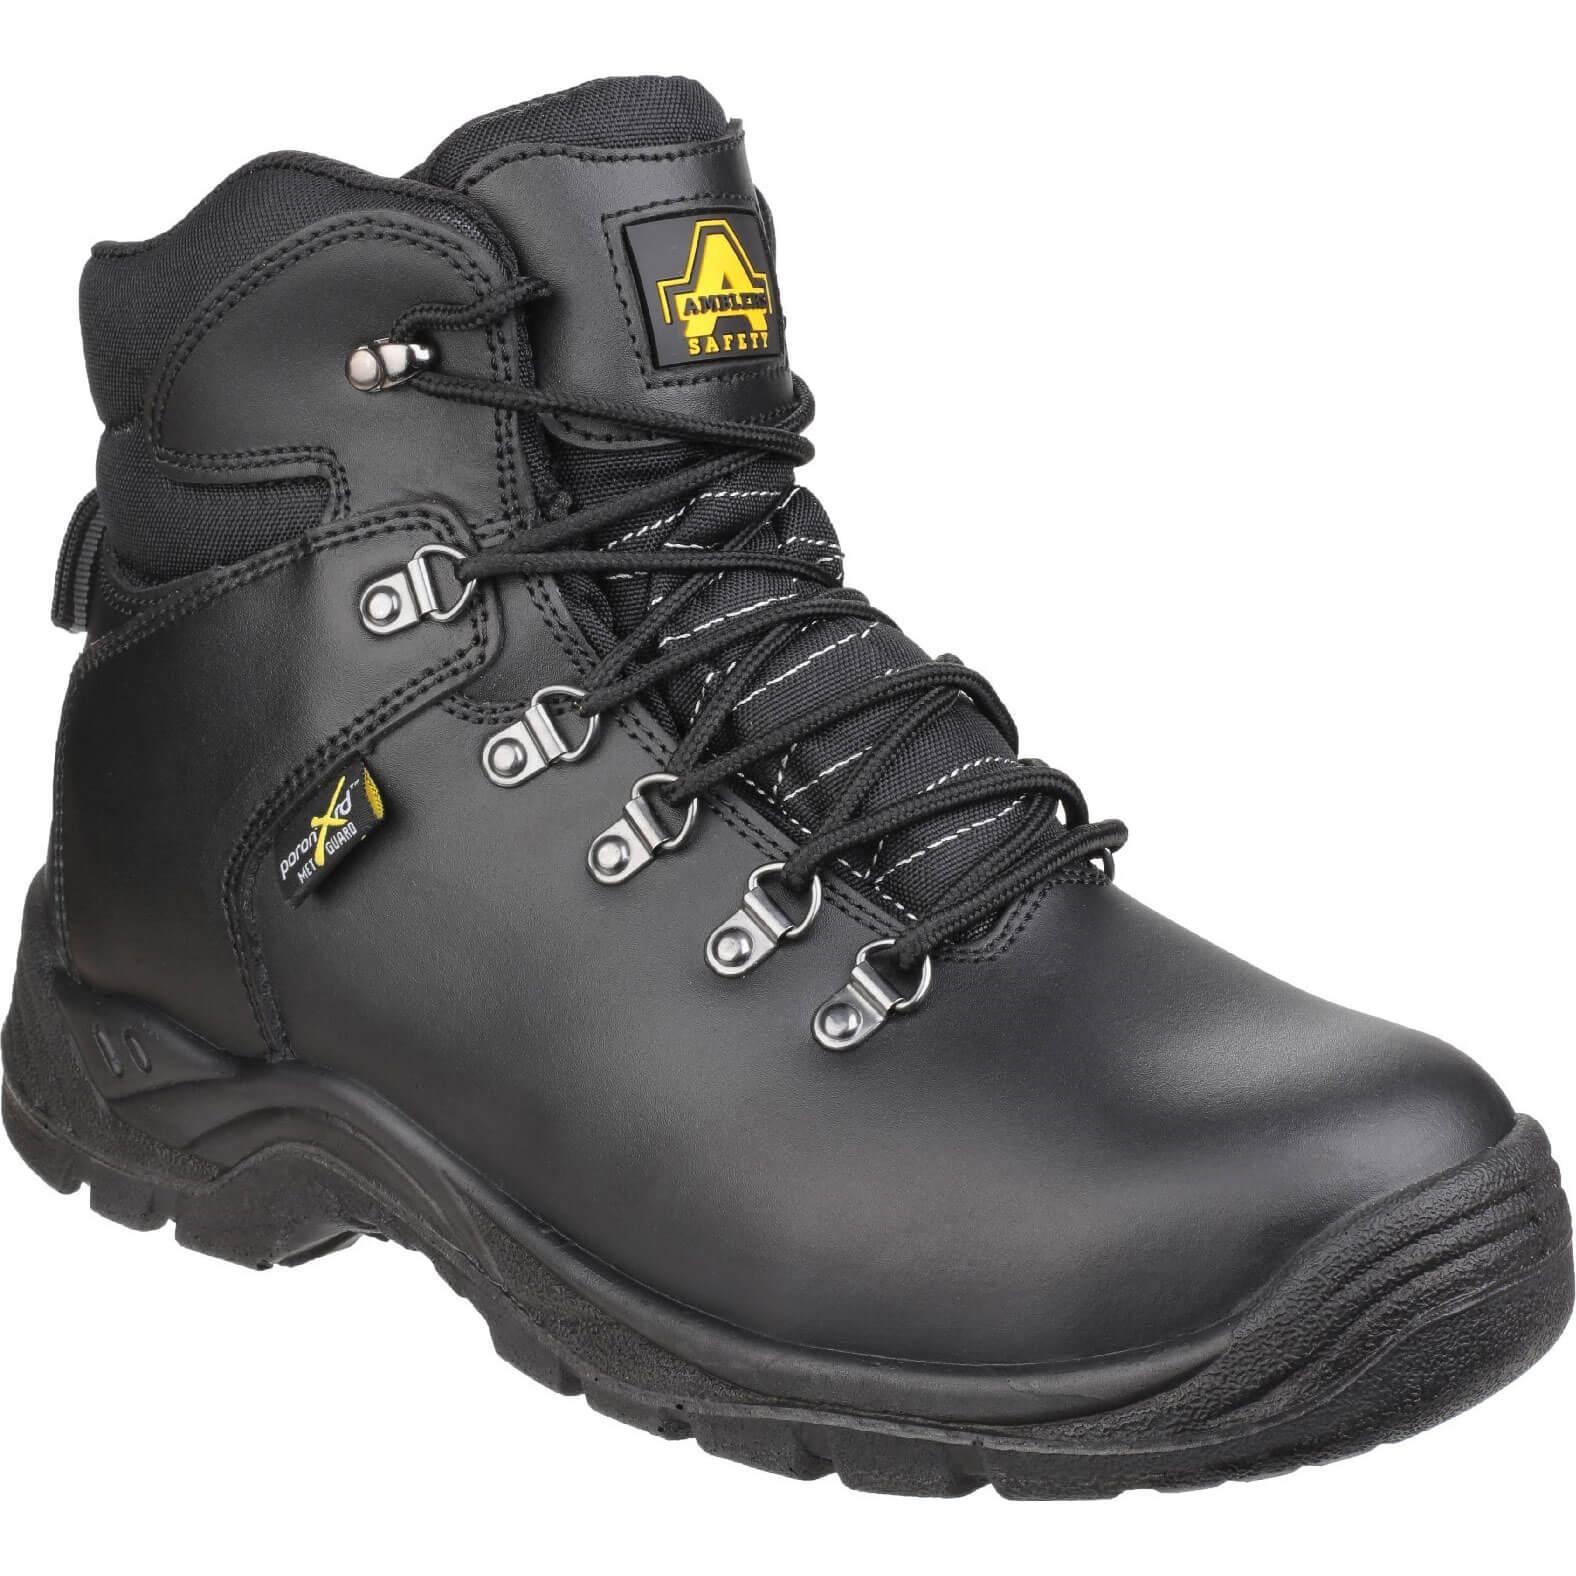 CHEAP Amblers Mens Safety As335 Poron Xrd Internal Metatarsal Safety Boots Black Size 9 – Men's Footwear